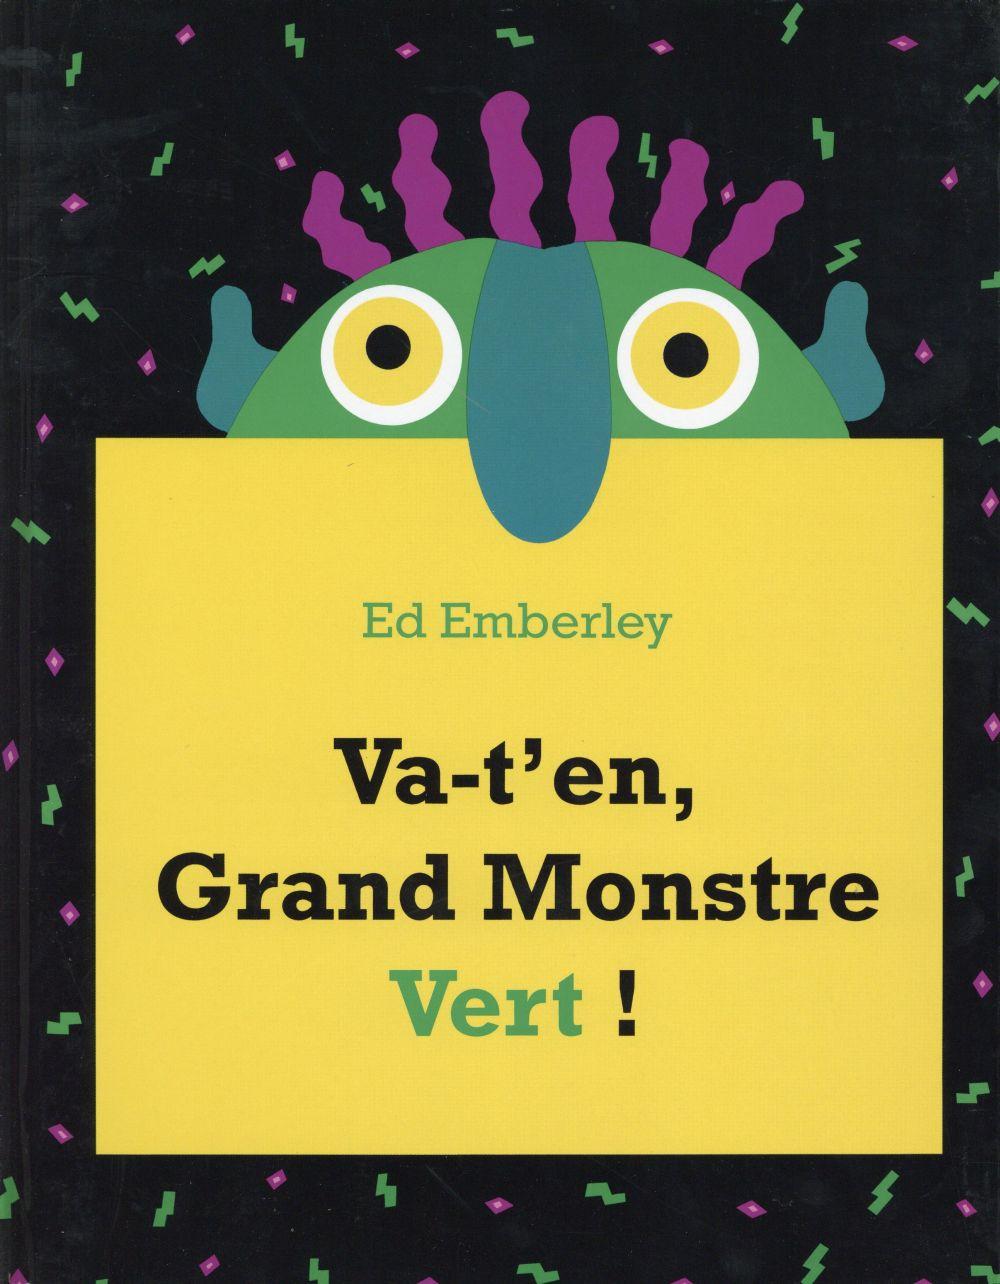 VA-T'EN, GRAND MONSTRE VERT !